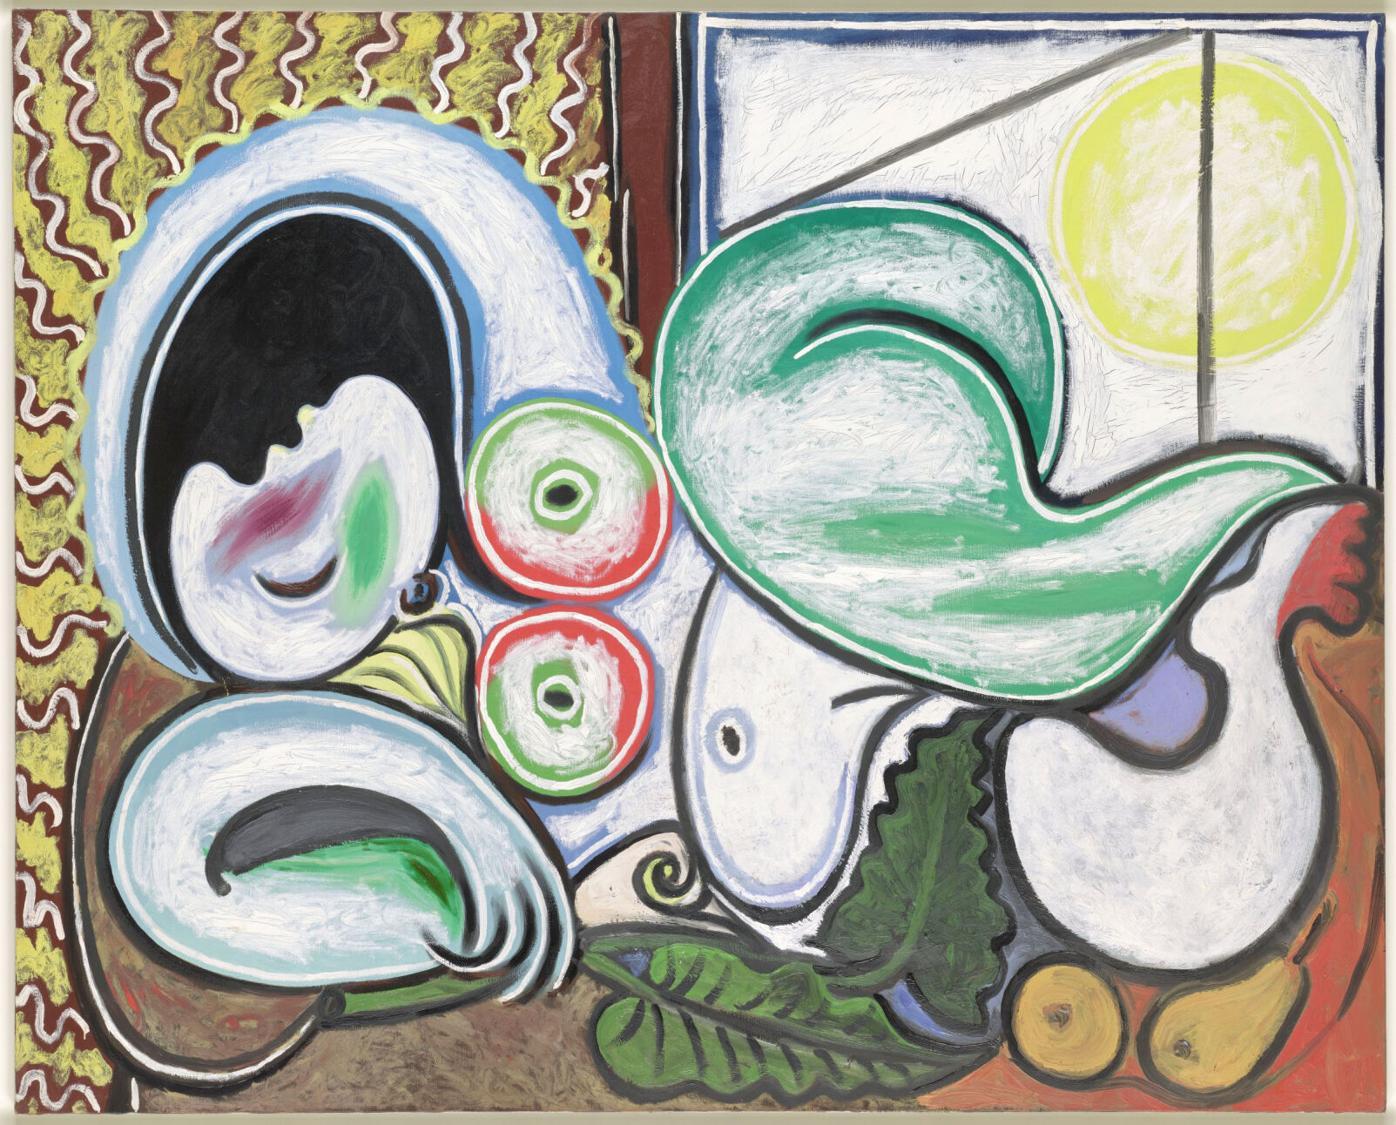 062321_MNS_Calder_Picasso_004 Pablo Picasso Reclining Nude